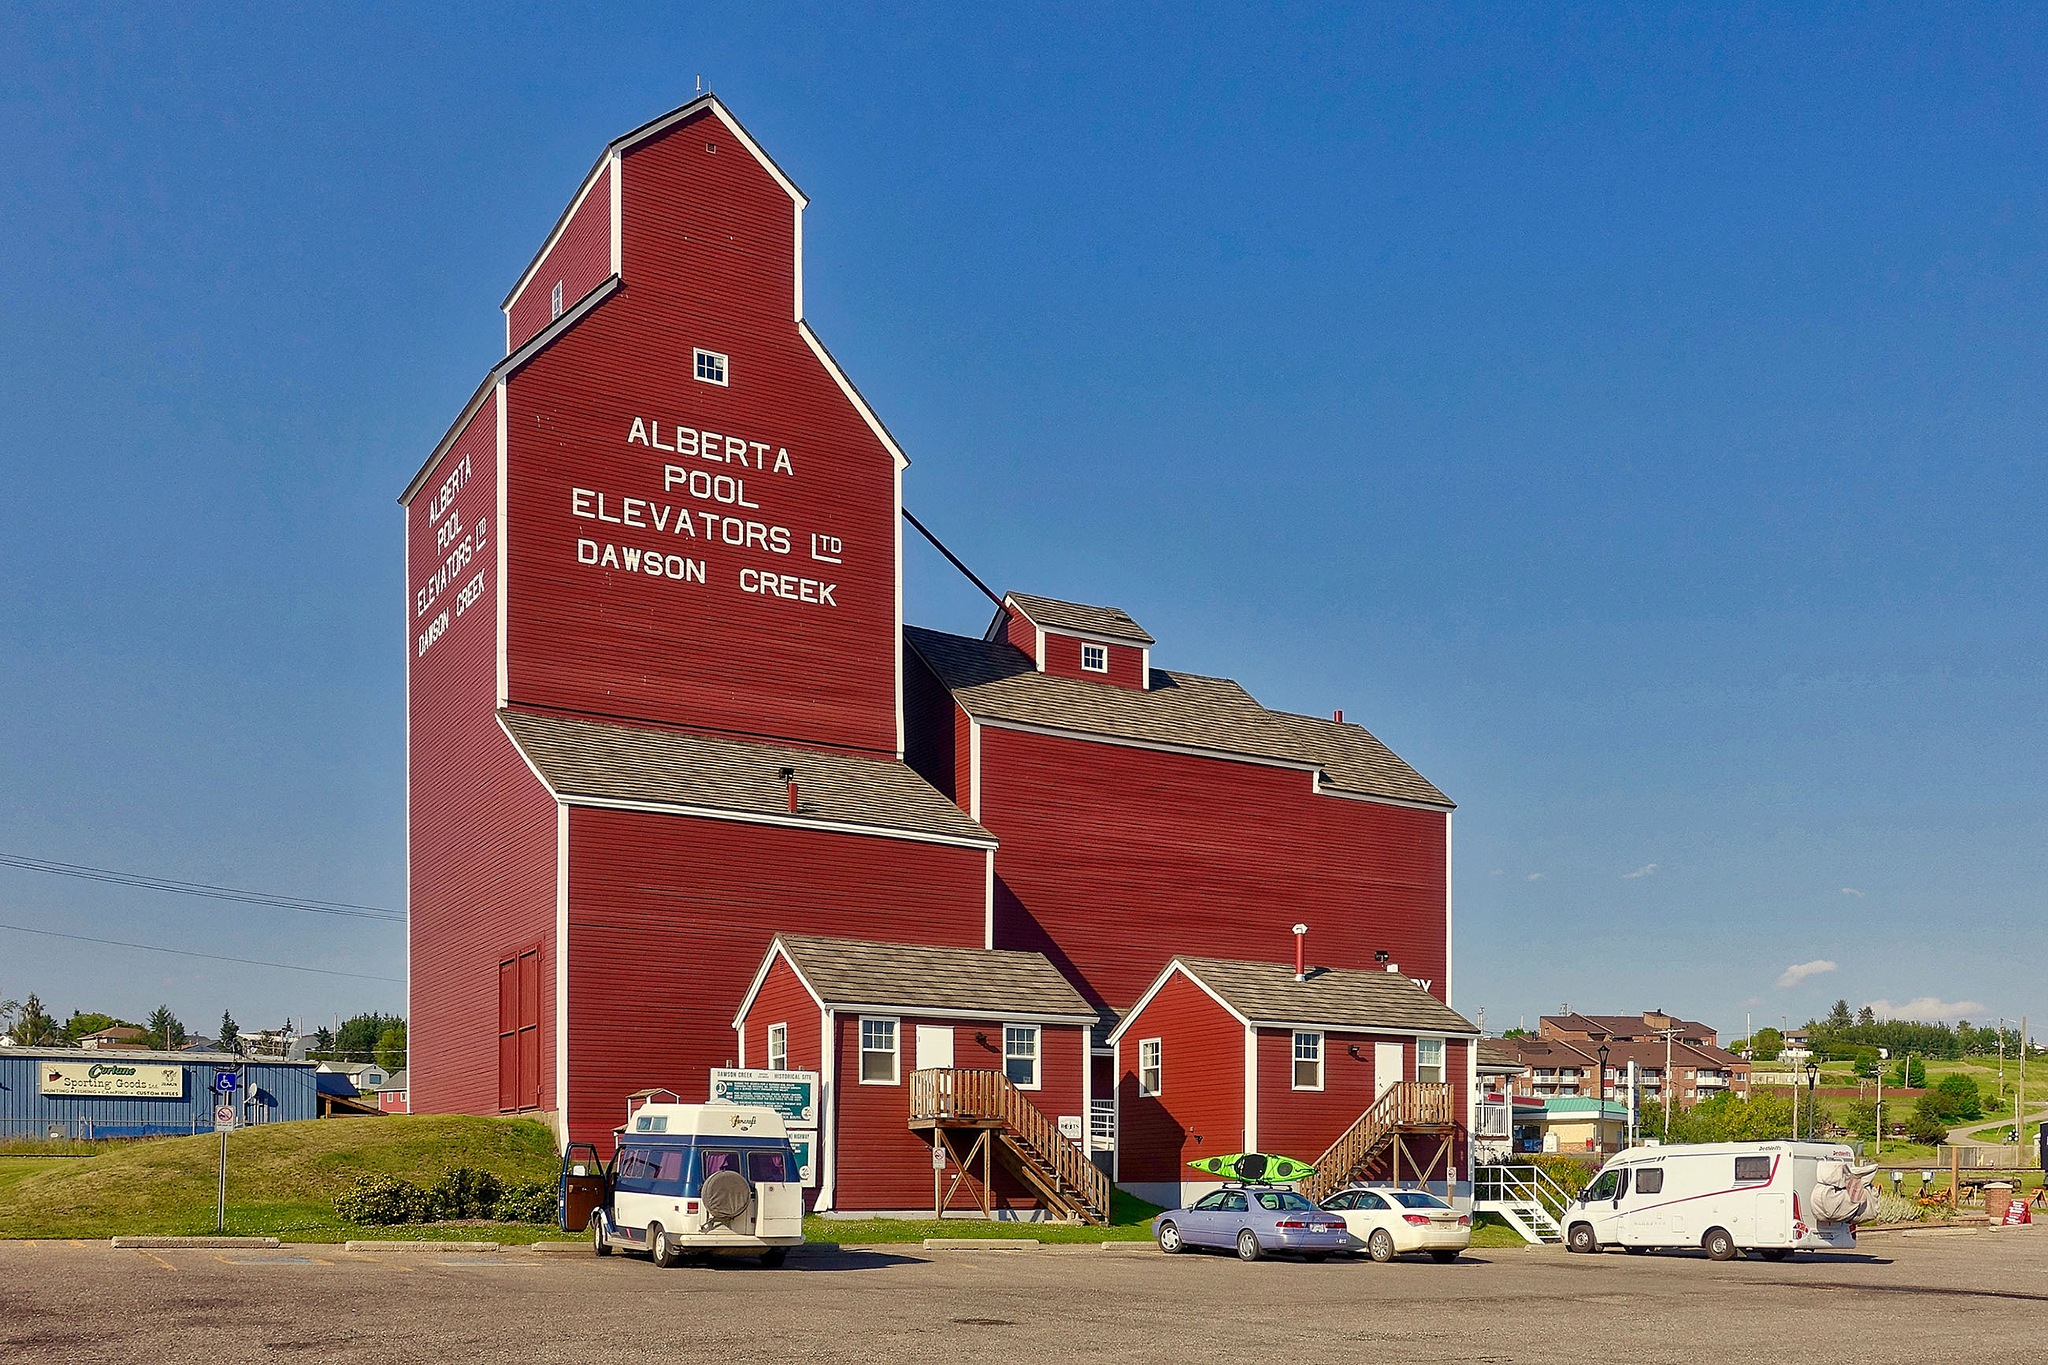 The grain elevator in Dawson Creek in Canada. by Erwin Widmer